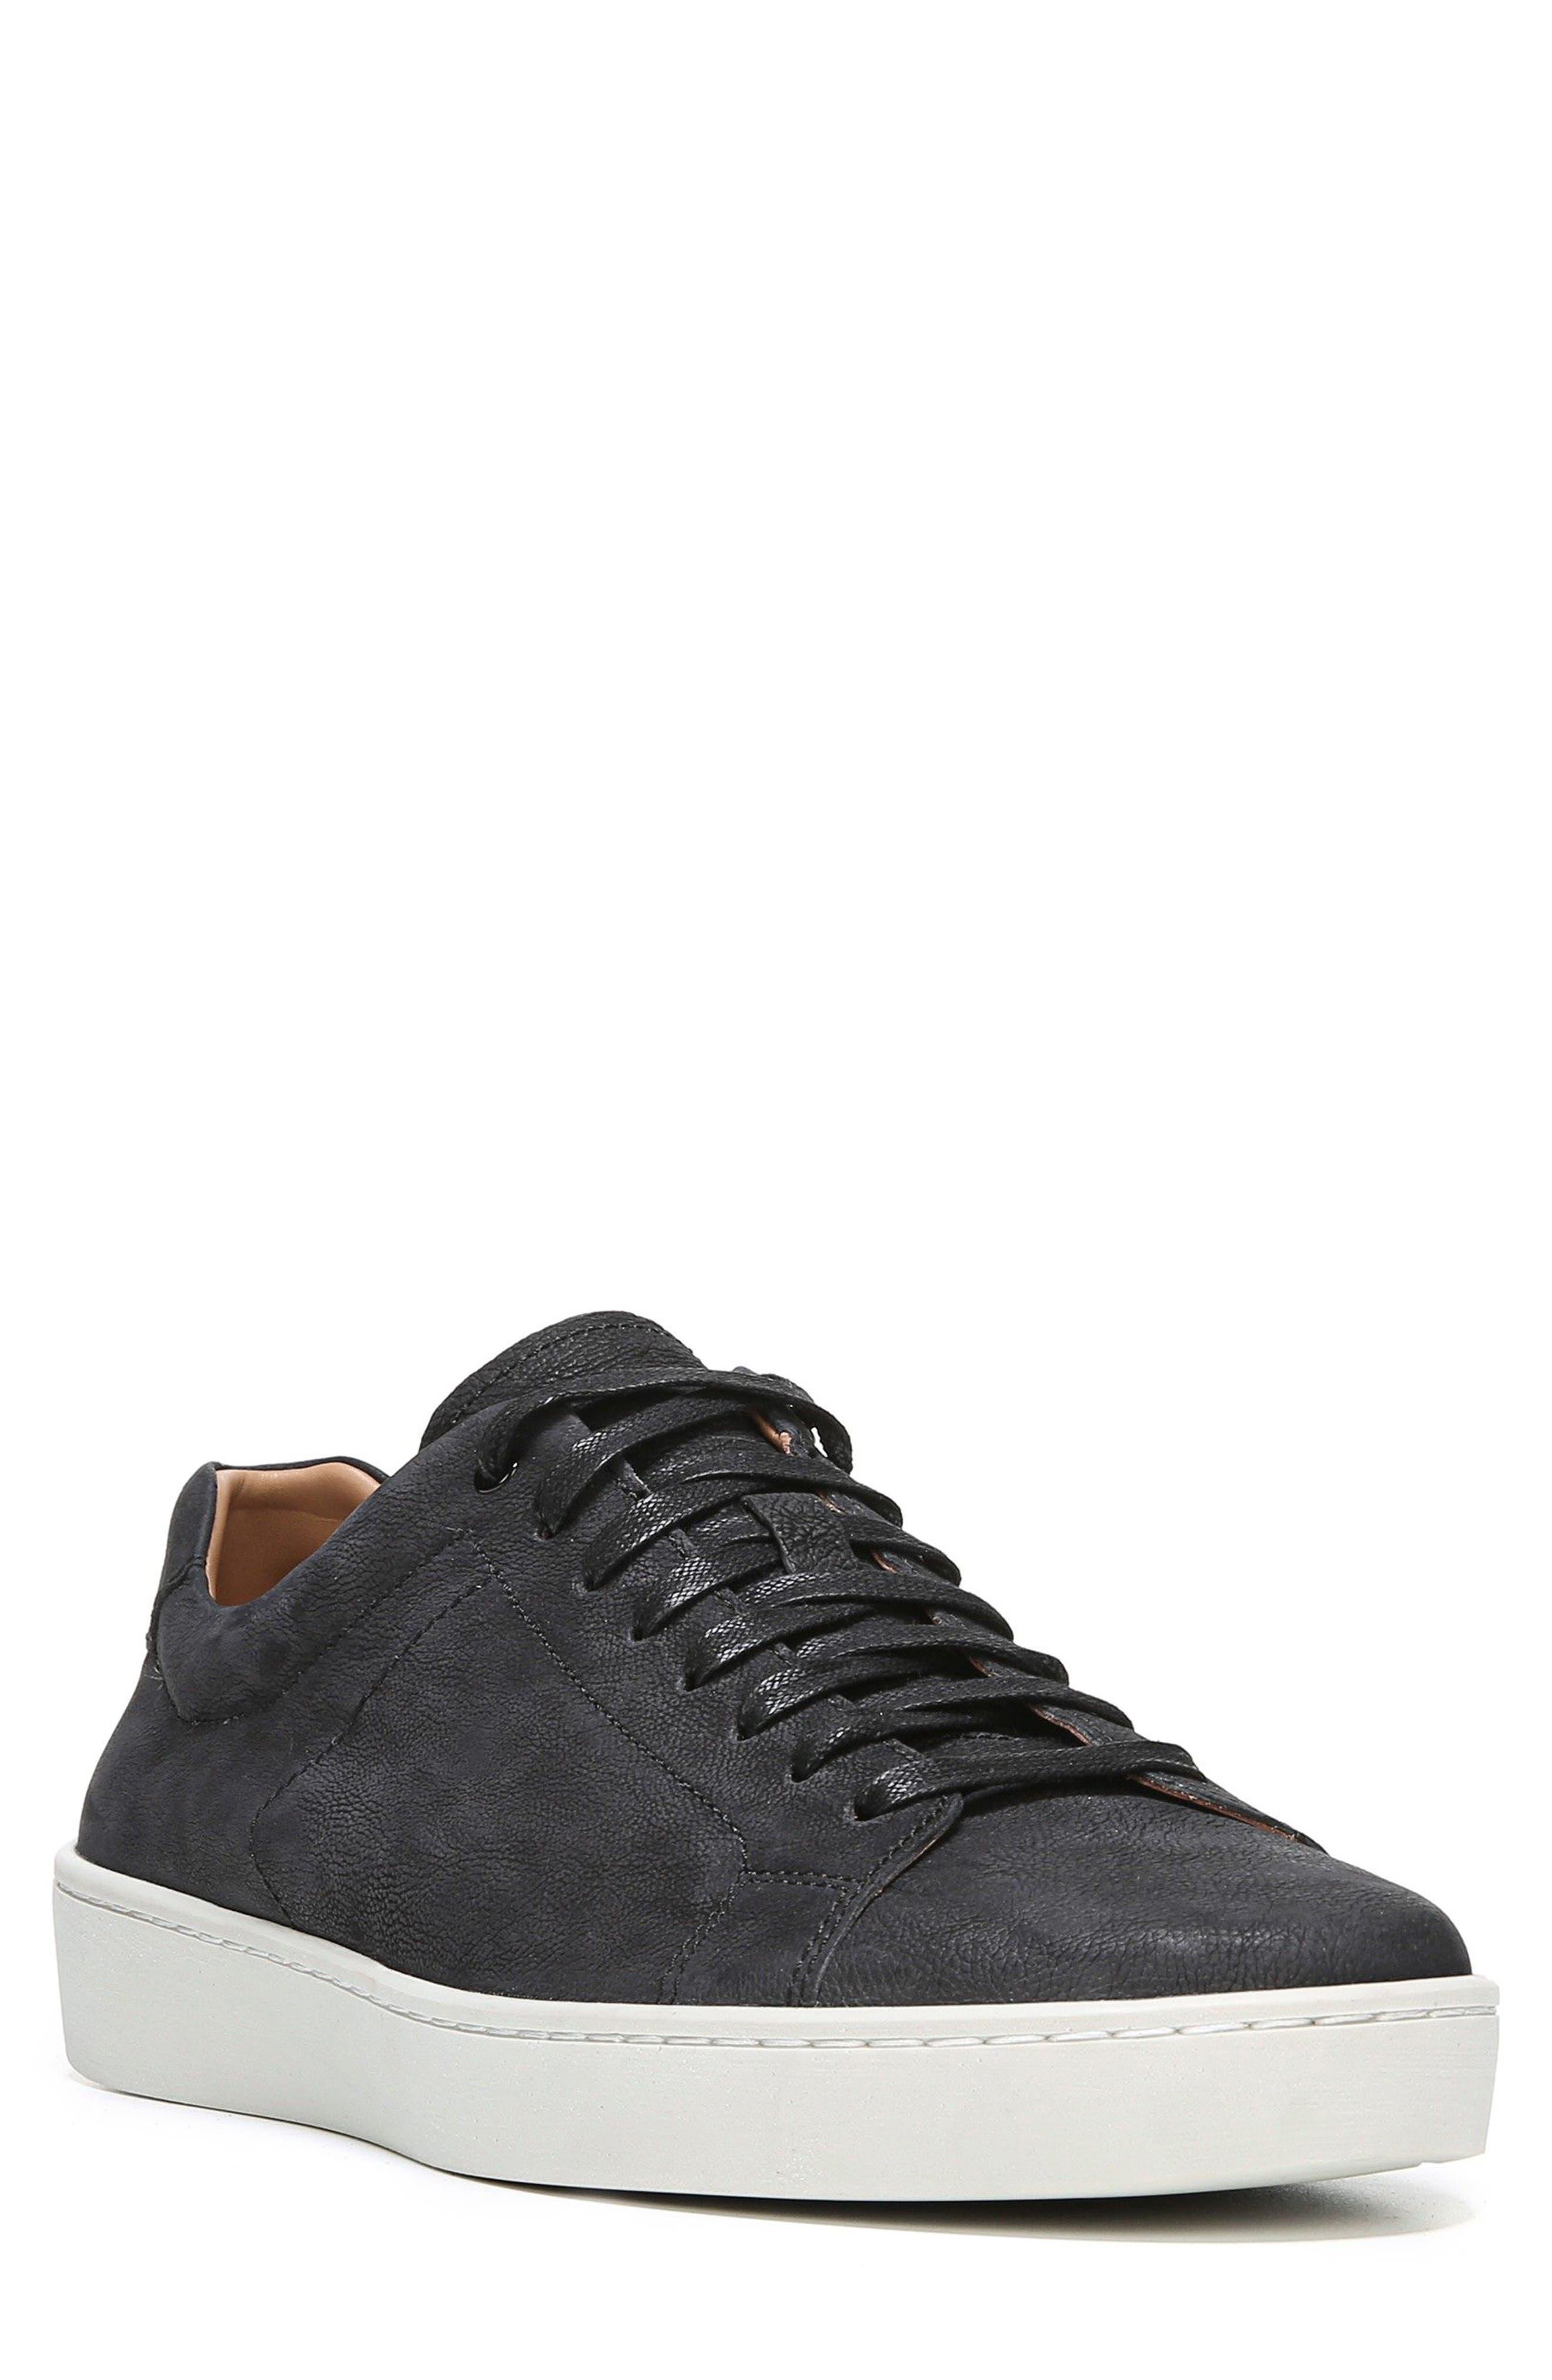 Slater Sneaker,                             Main thumbnail 1, color,                             BLACK NUBUCK